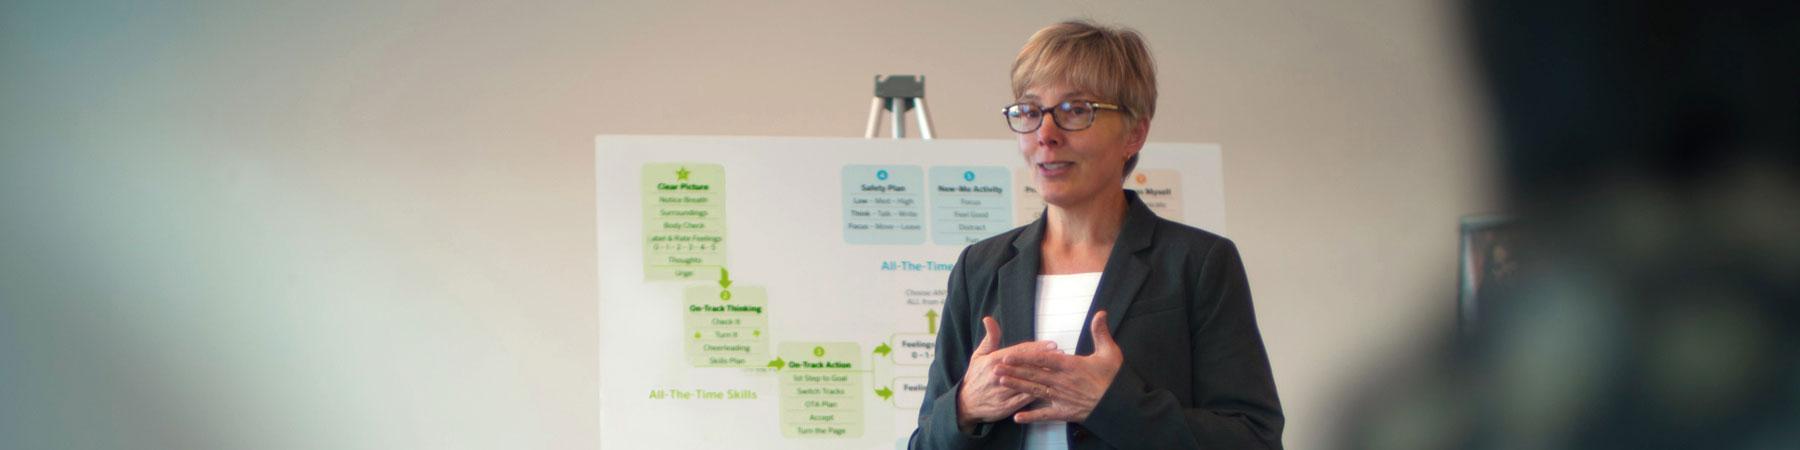 Julie Brown Training Session